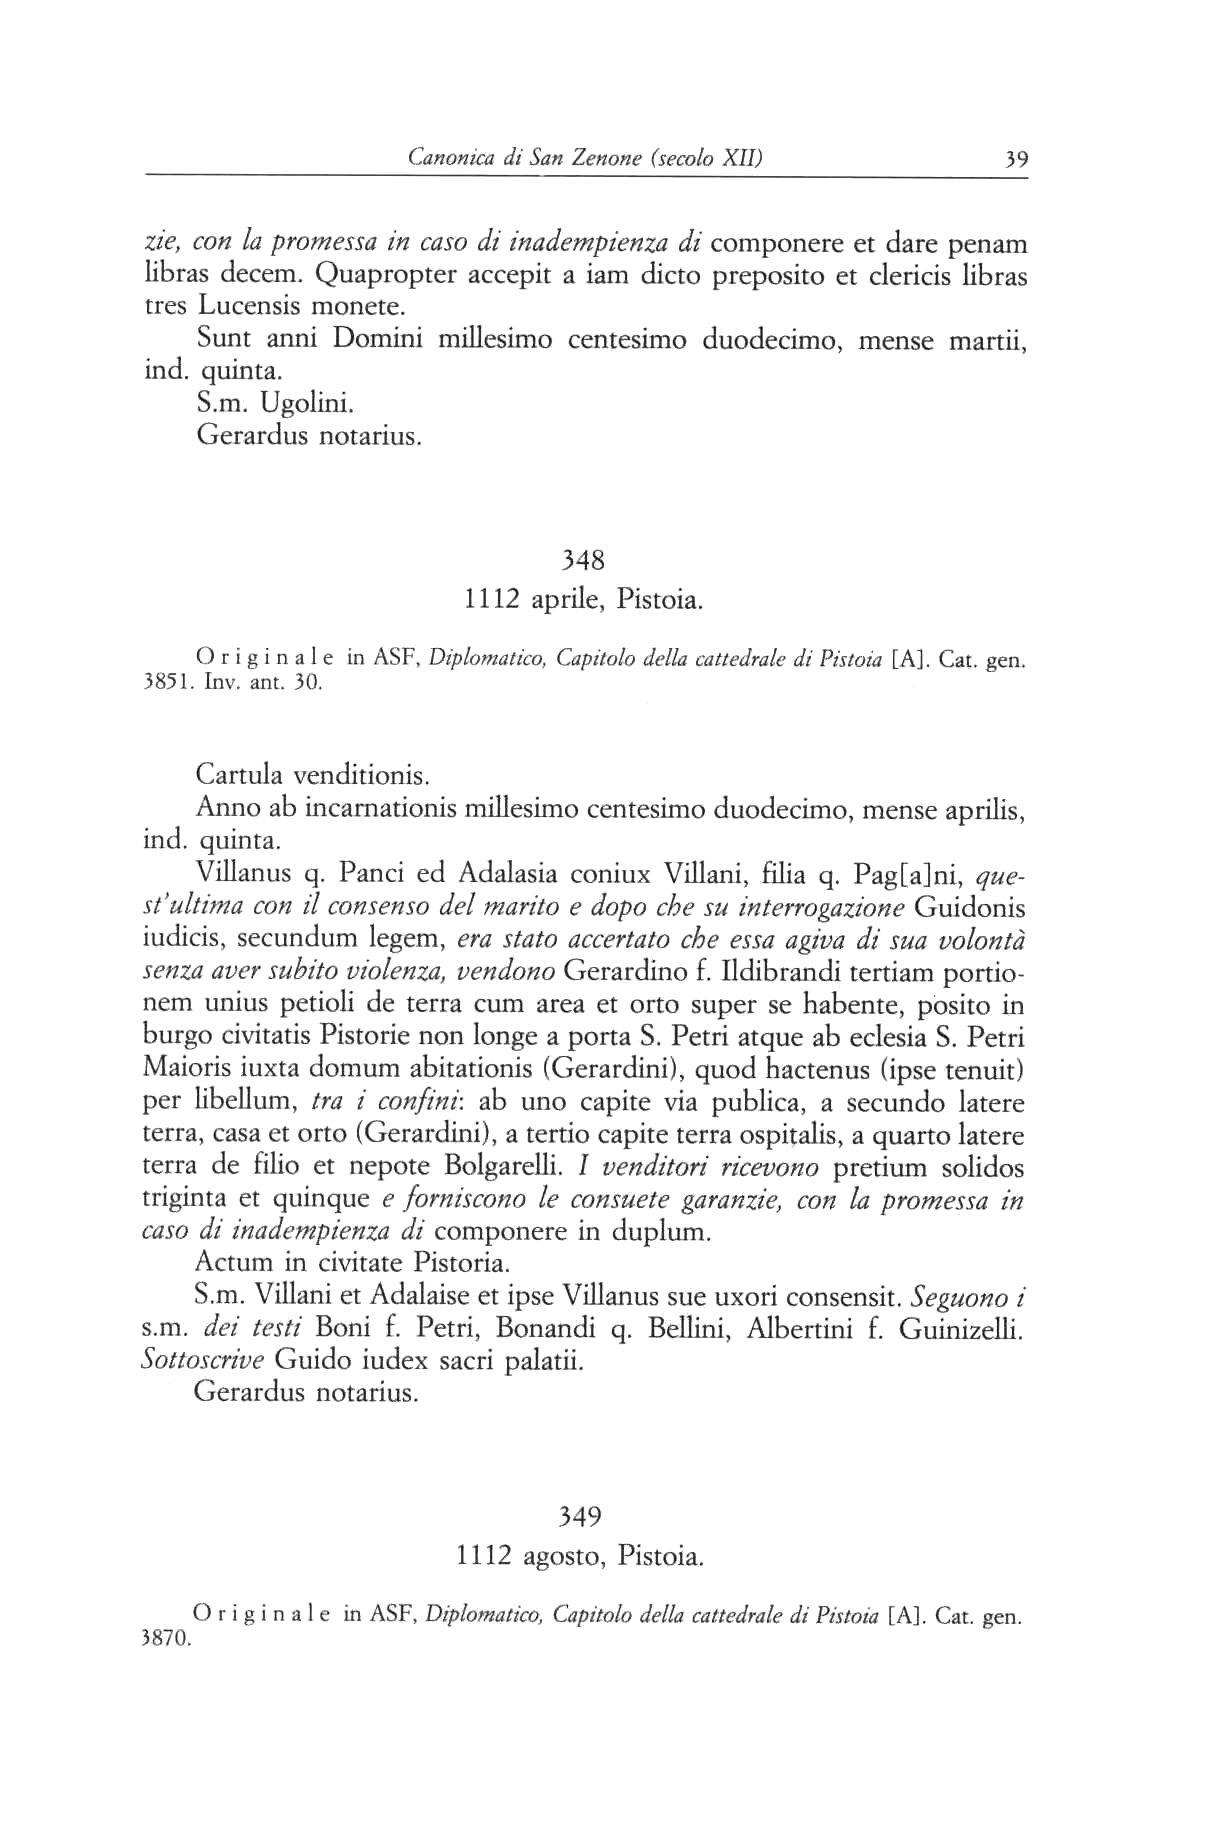 Canonica S. Zenone XII 0039.jpg